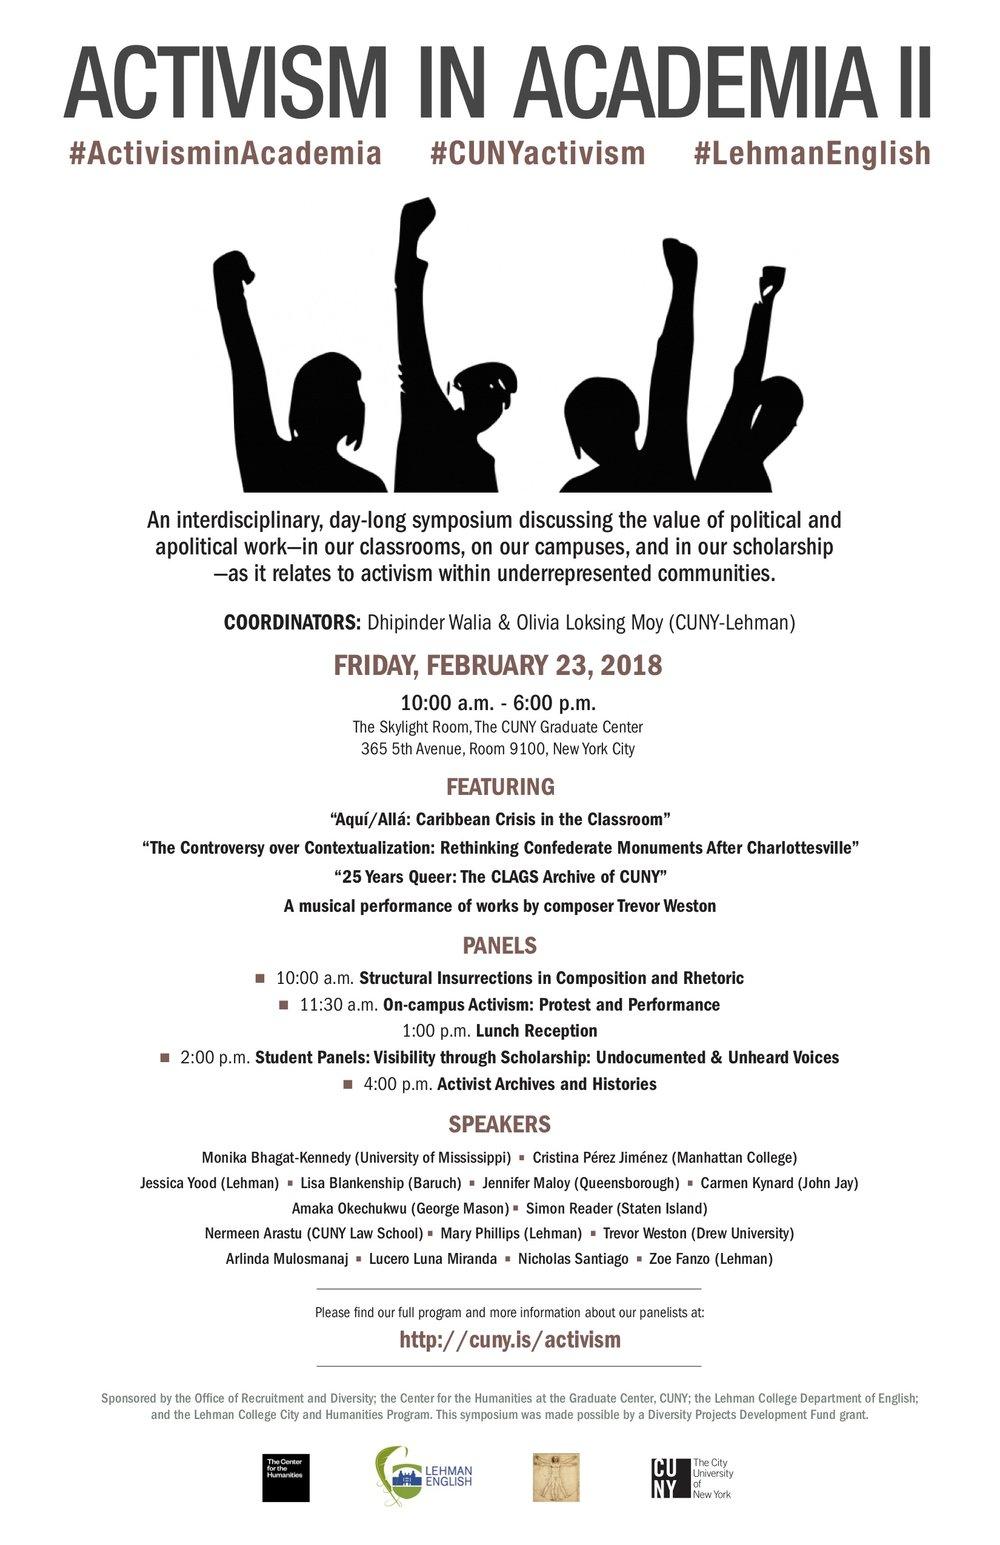 Activism in Academia poster 2018.jpg